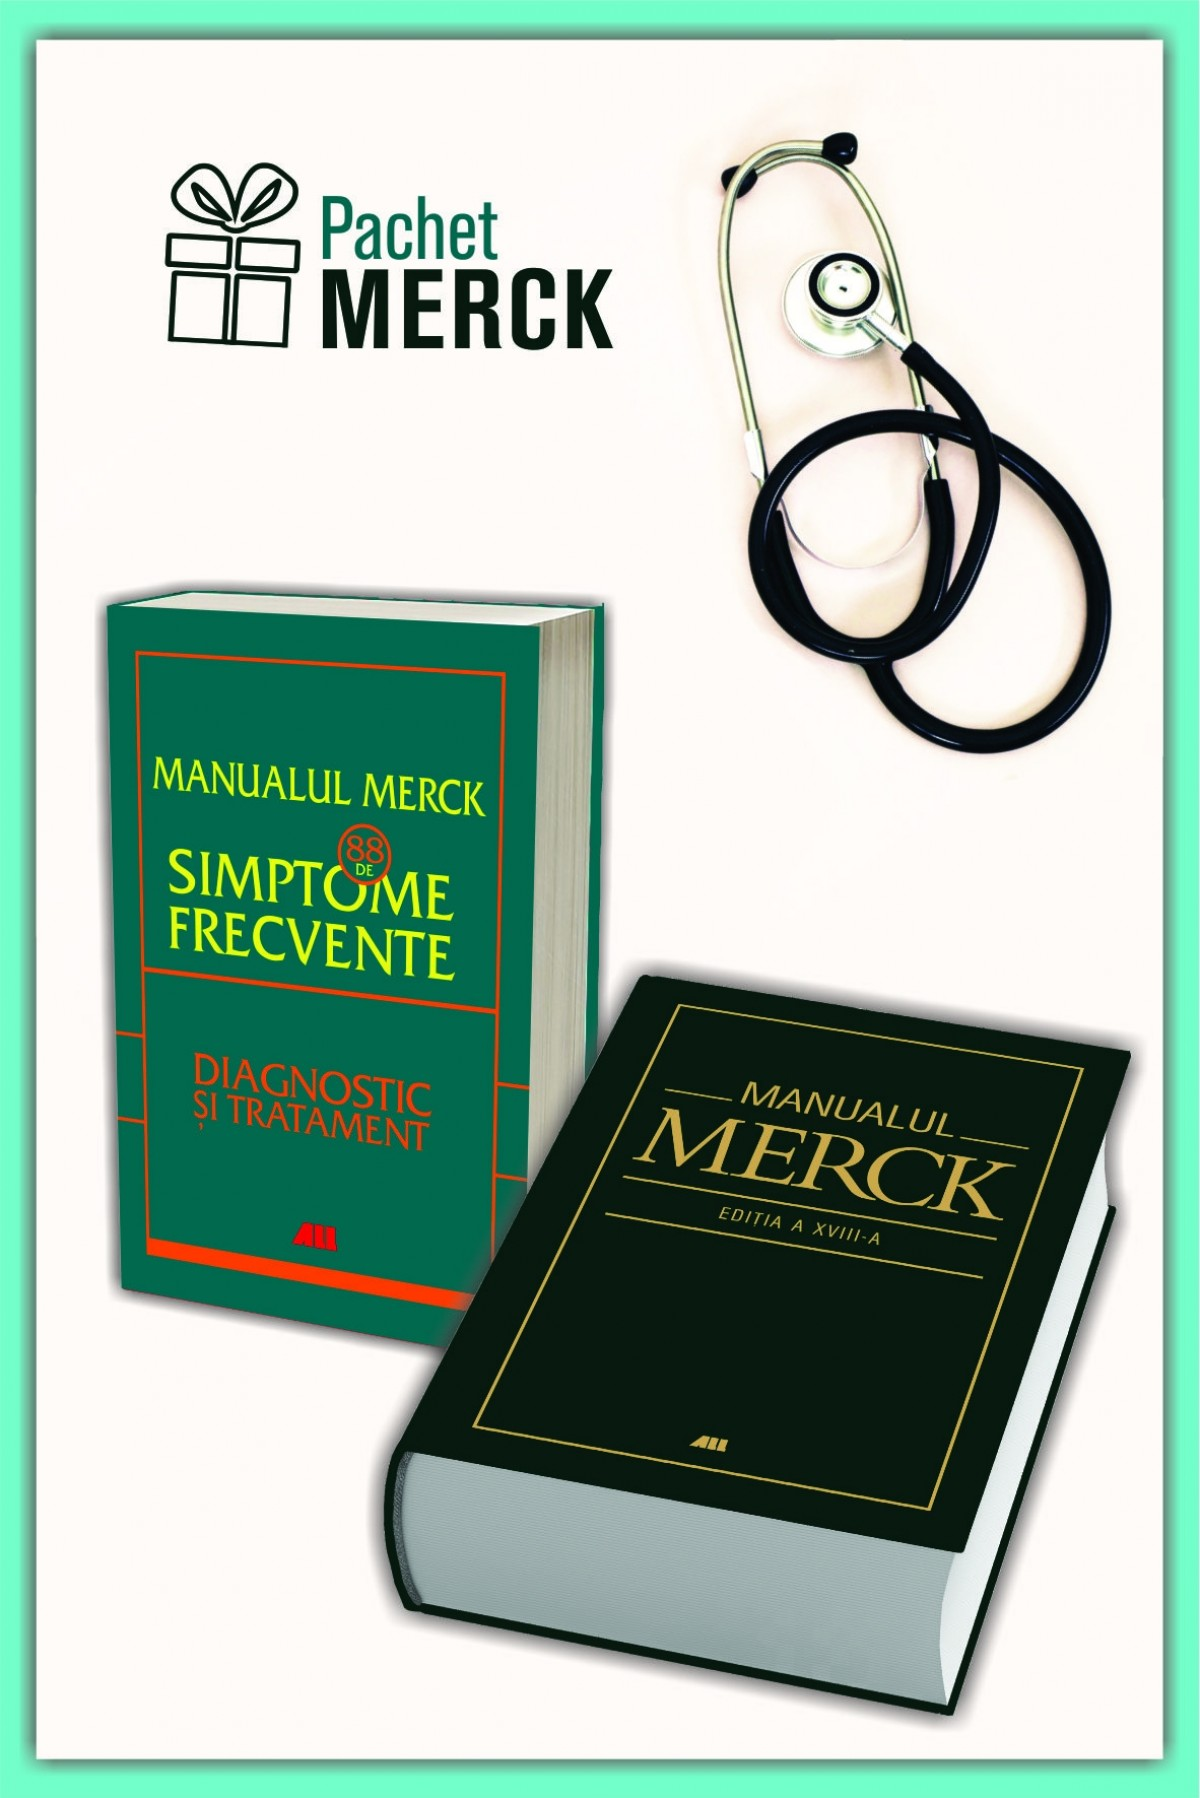 Pachet Merck